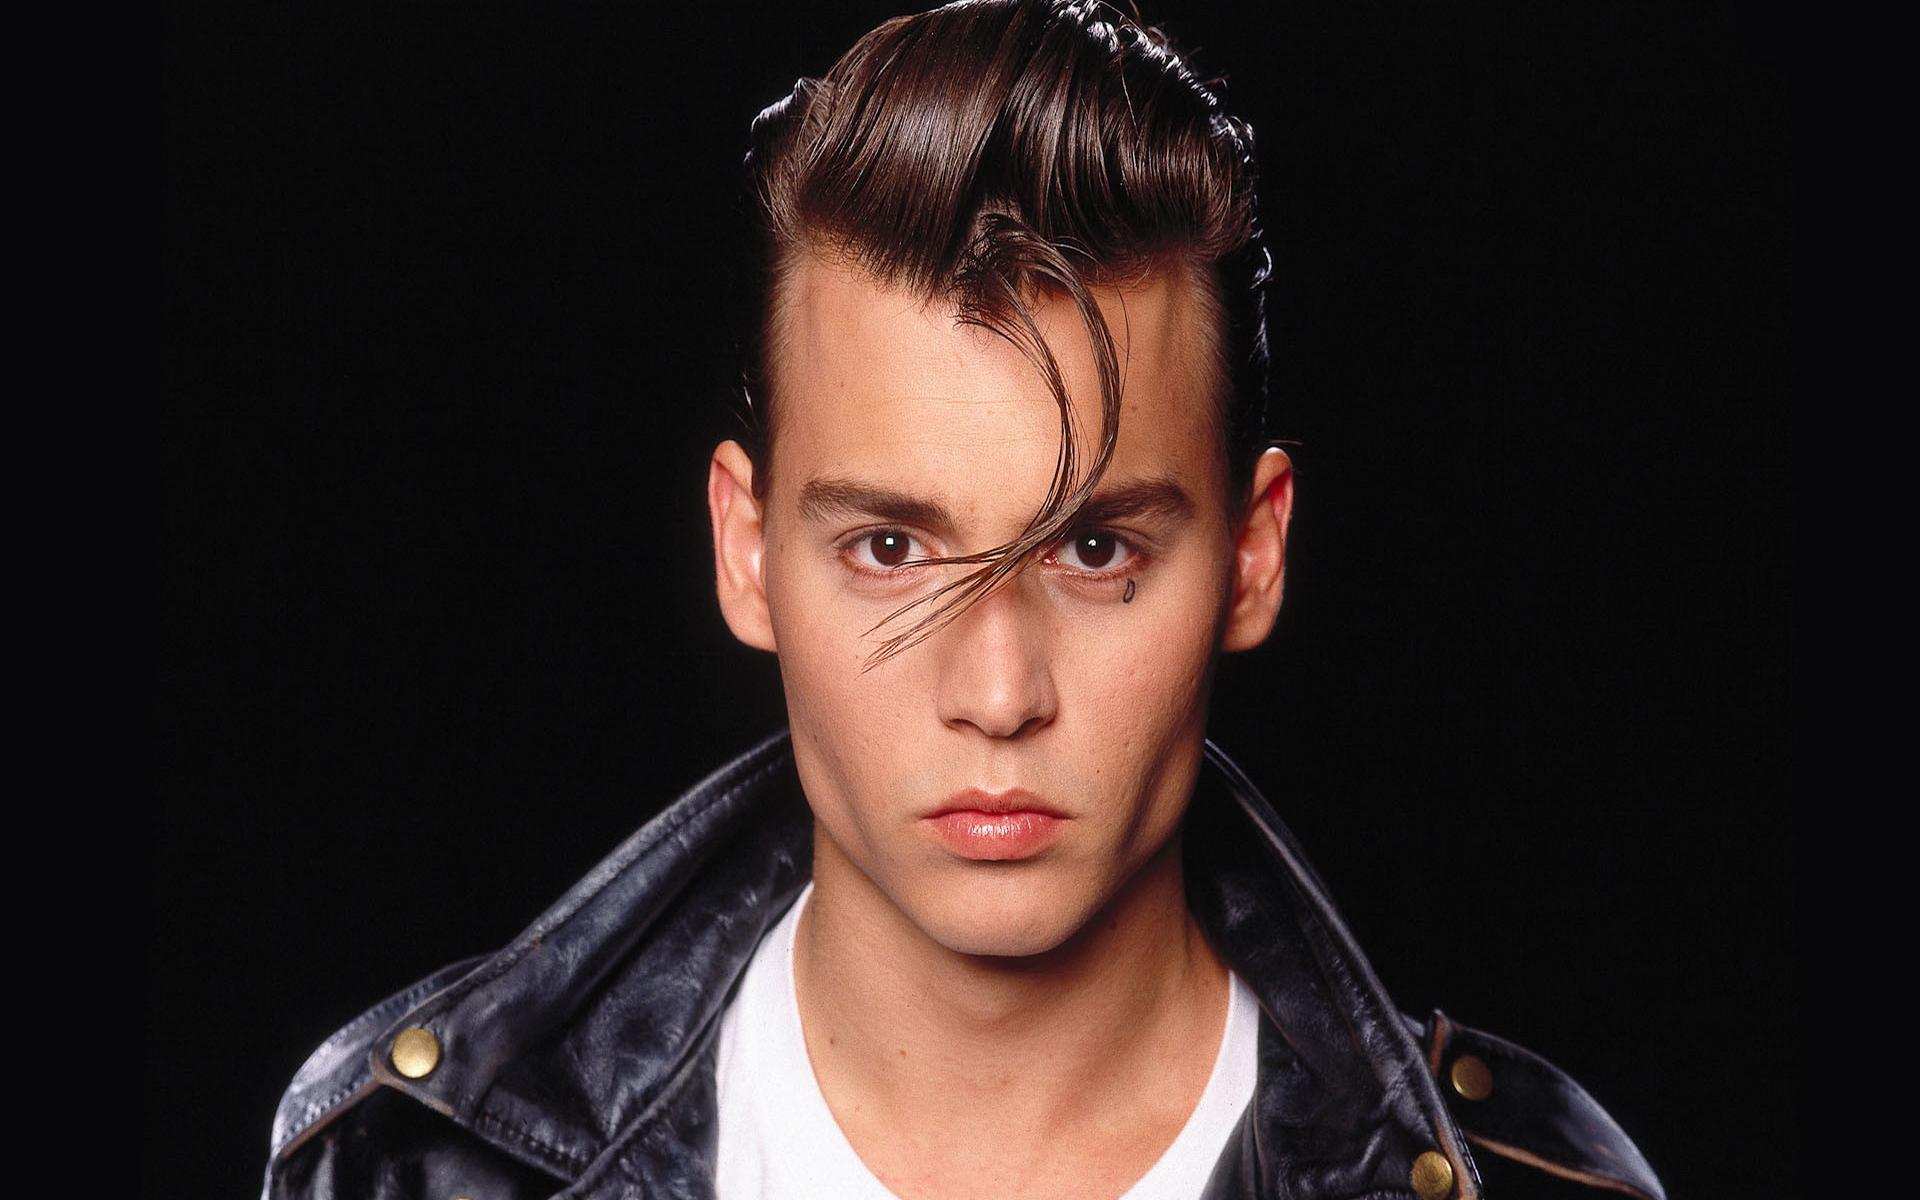 Johnny Depp Wallpaper Teen - HD Desktop Wallpapers